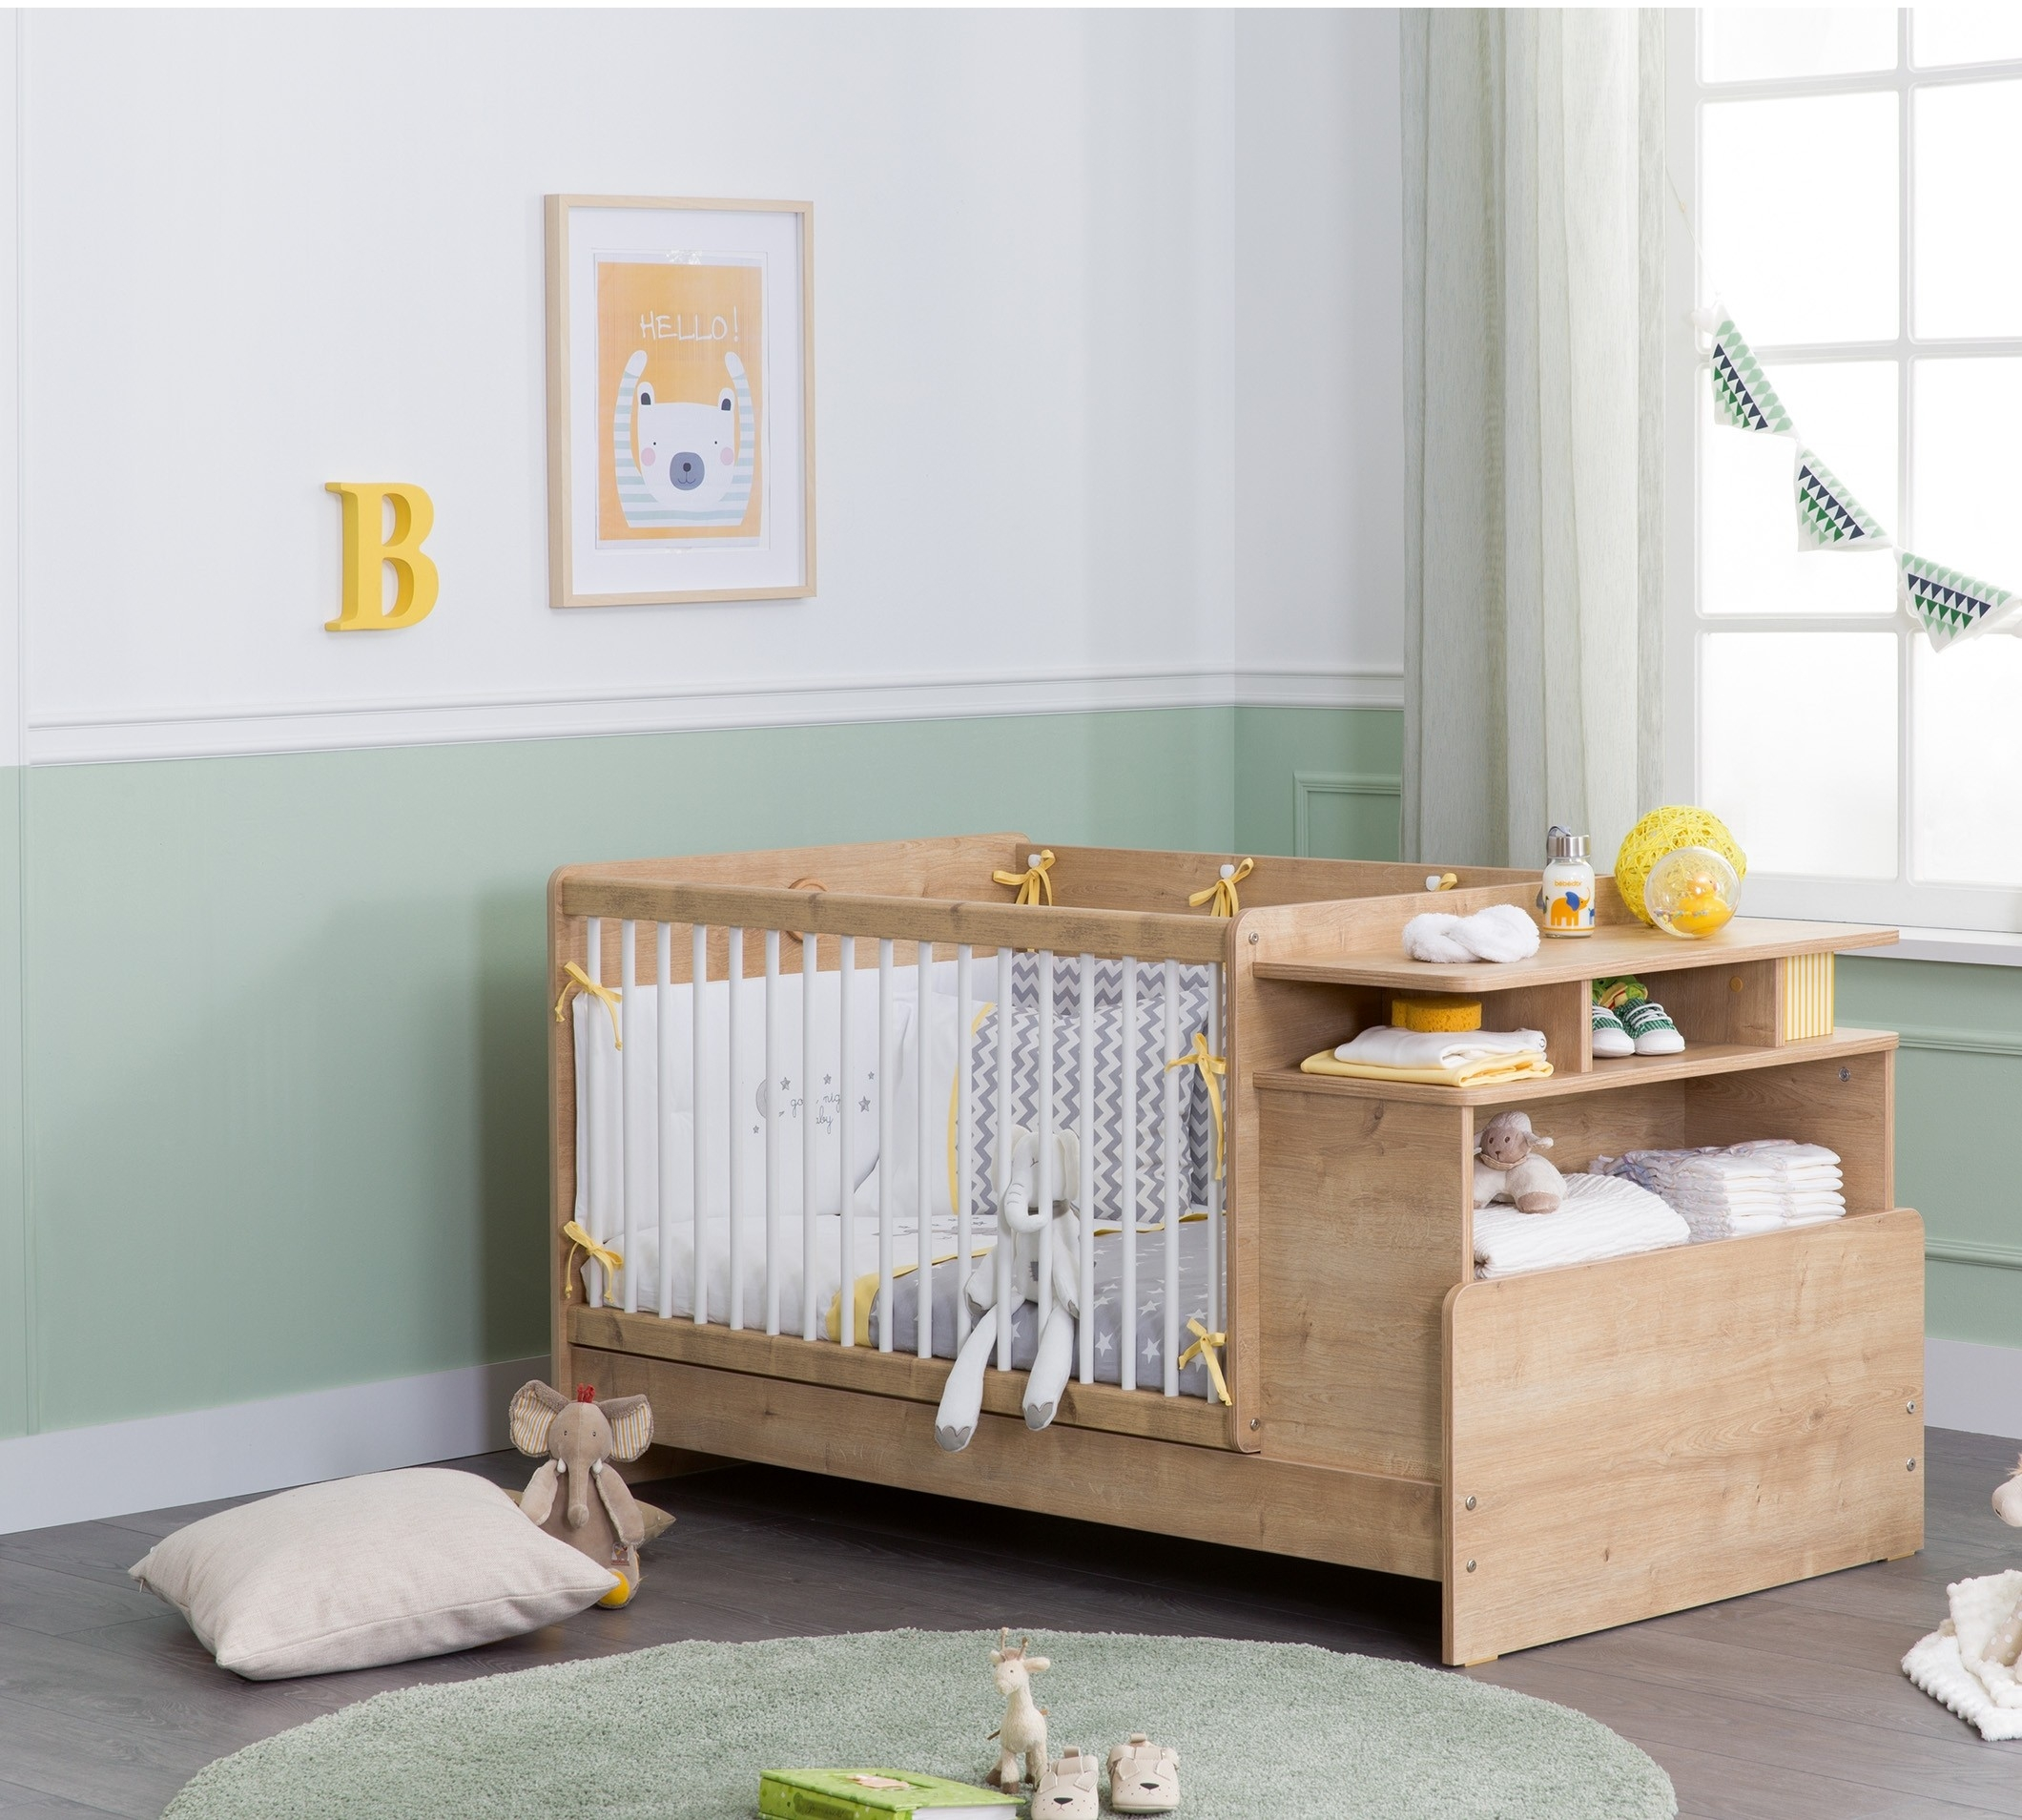 Patut transformabil din pal, pentru bebe Masali Baby Stejar, 110 x 70 cm poza